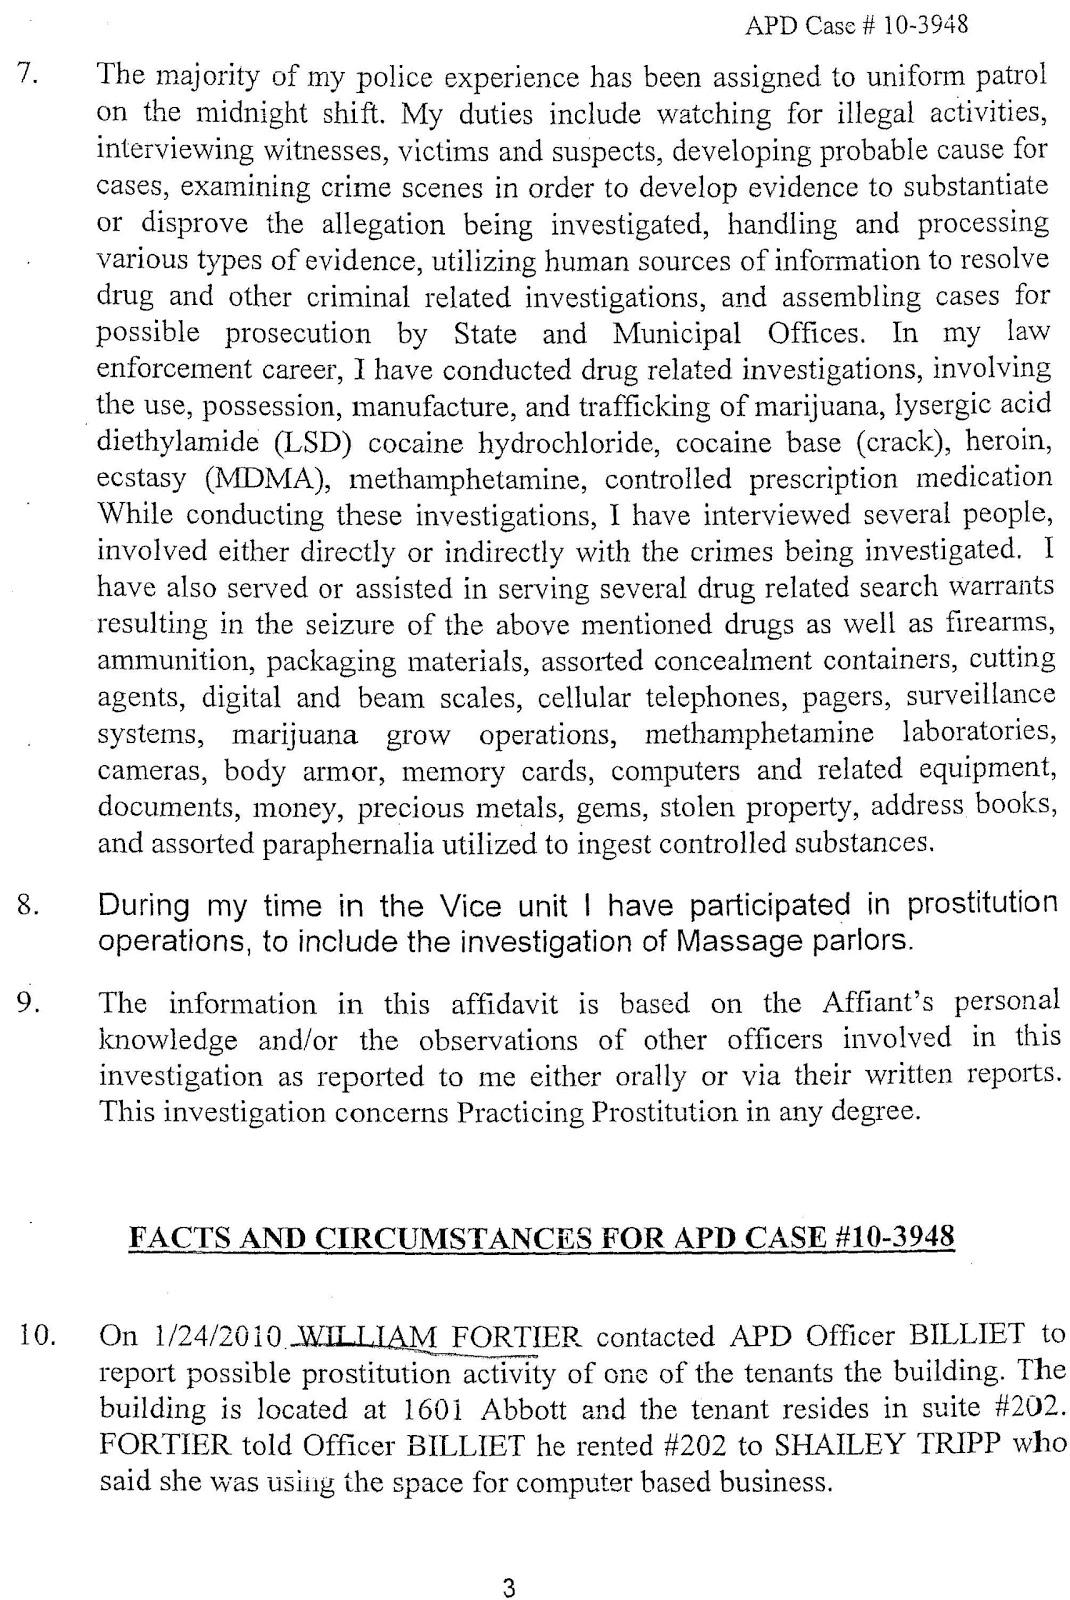 work circumstances resignation letter for unsatisfying circumstances